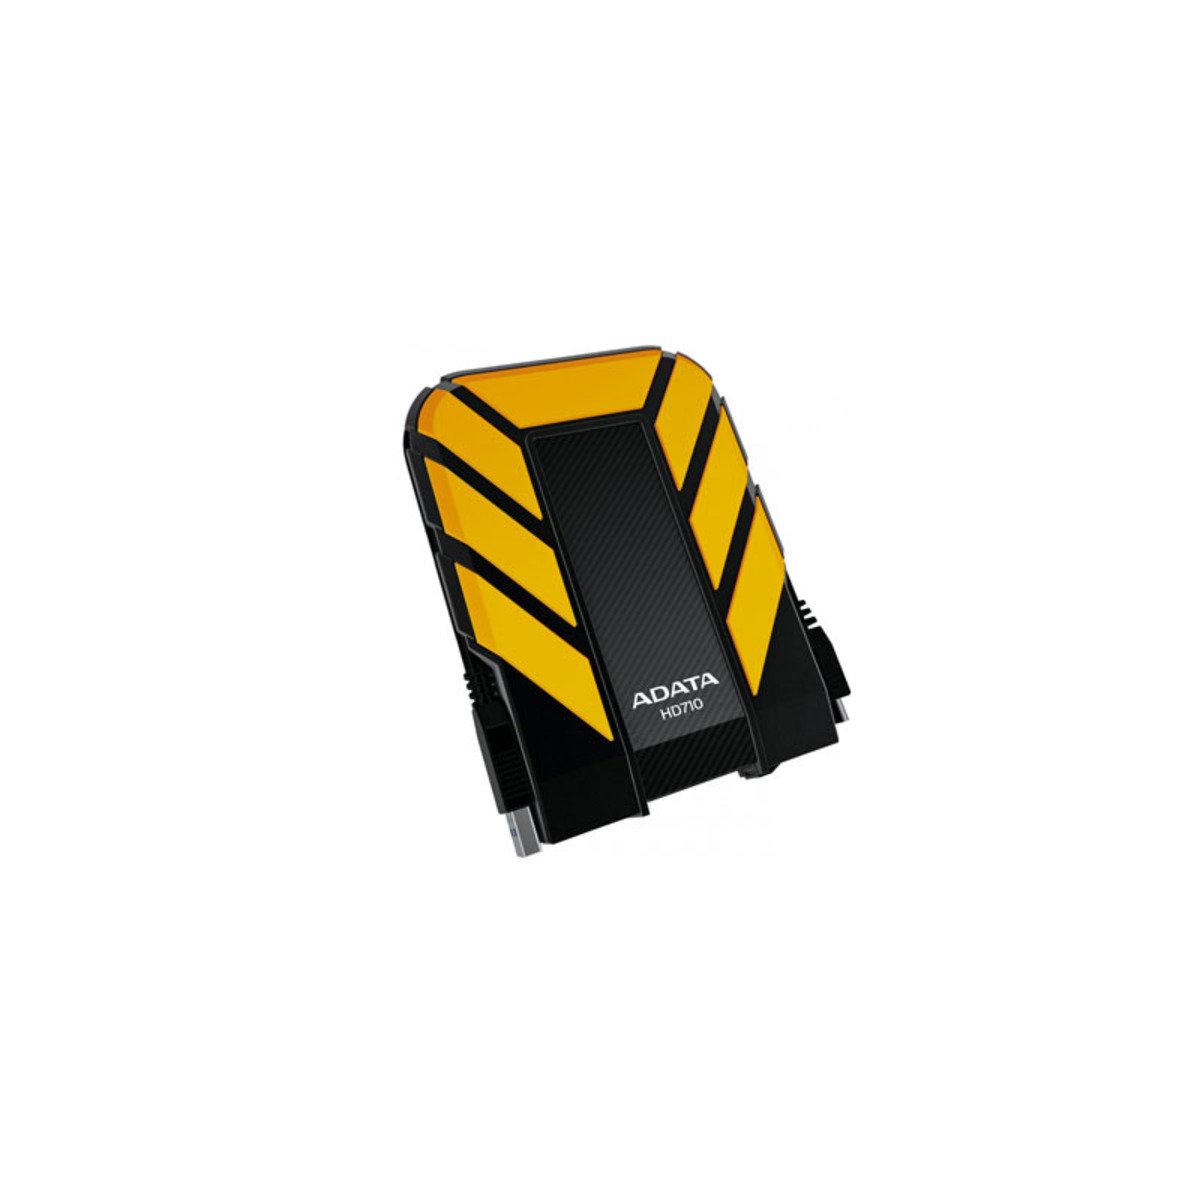 IP68 防水、防塵、抗震 USB 3.0 外置硬碟 HD710 2TB 黃色